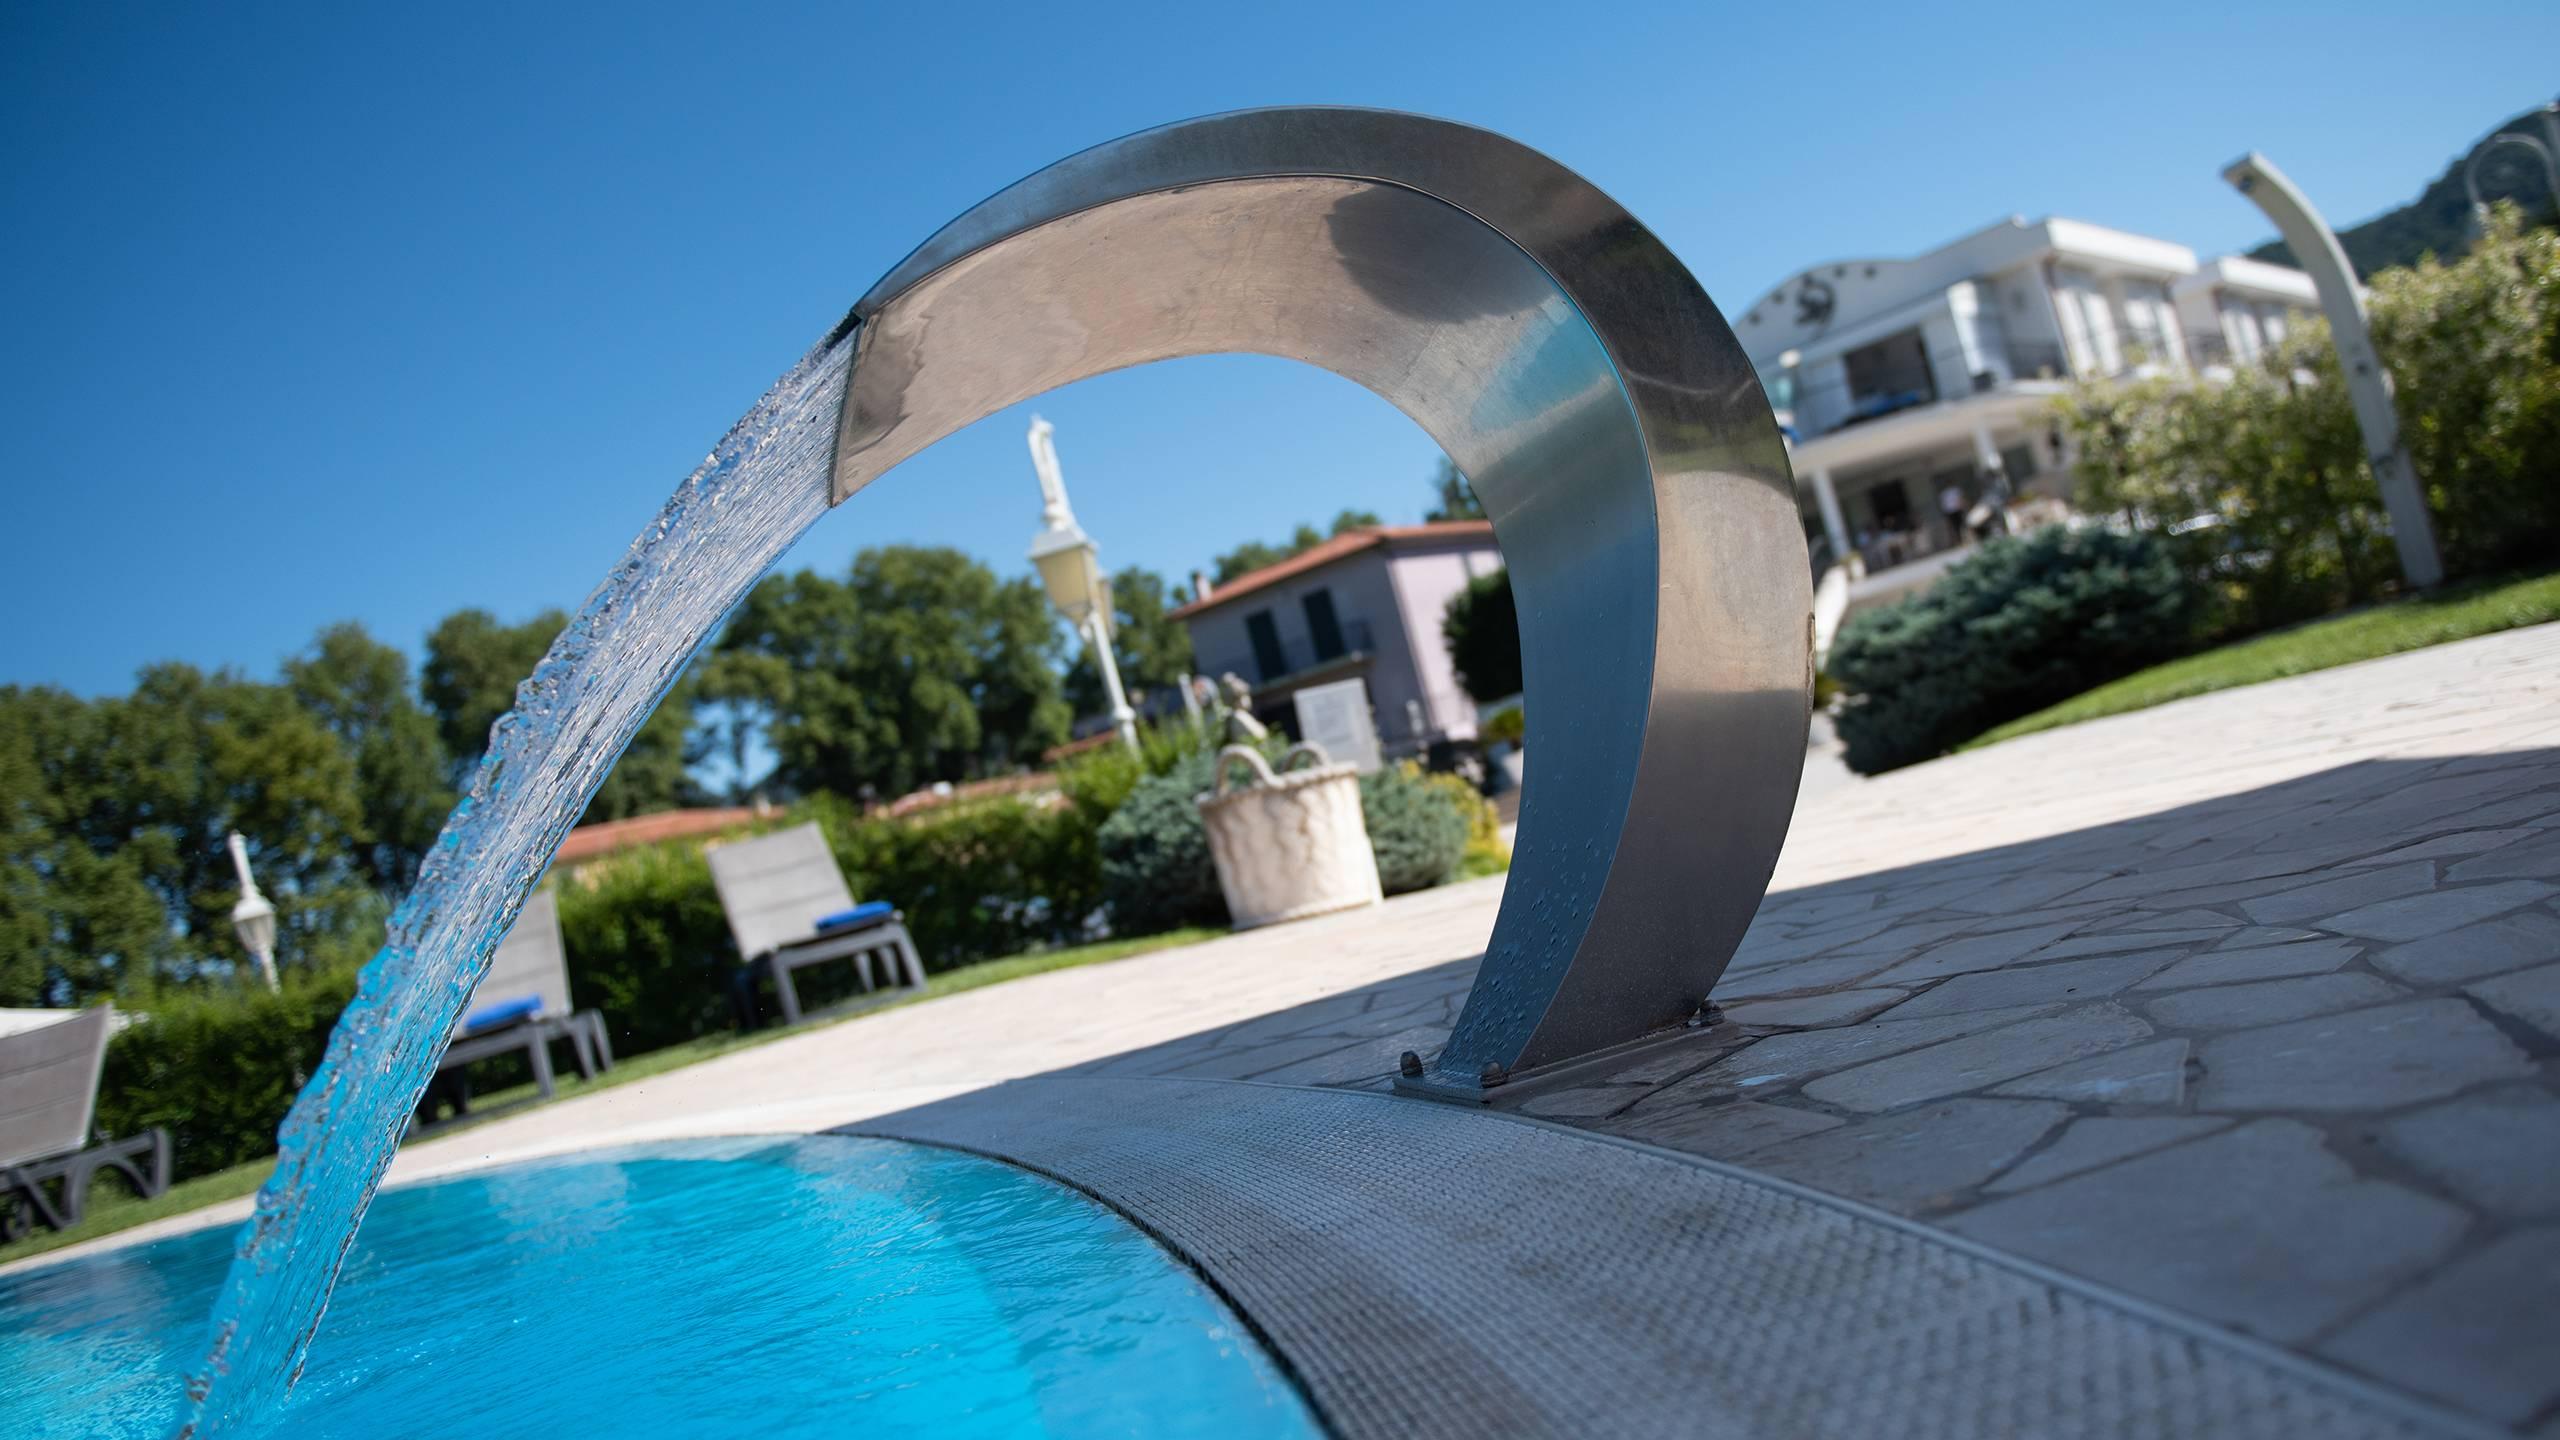 Ludwig-Boutique-Hotel-Bolsena-Details-Schwimmbad-CRI4644